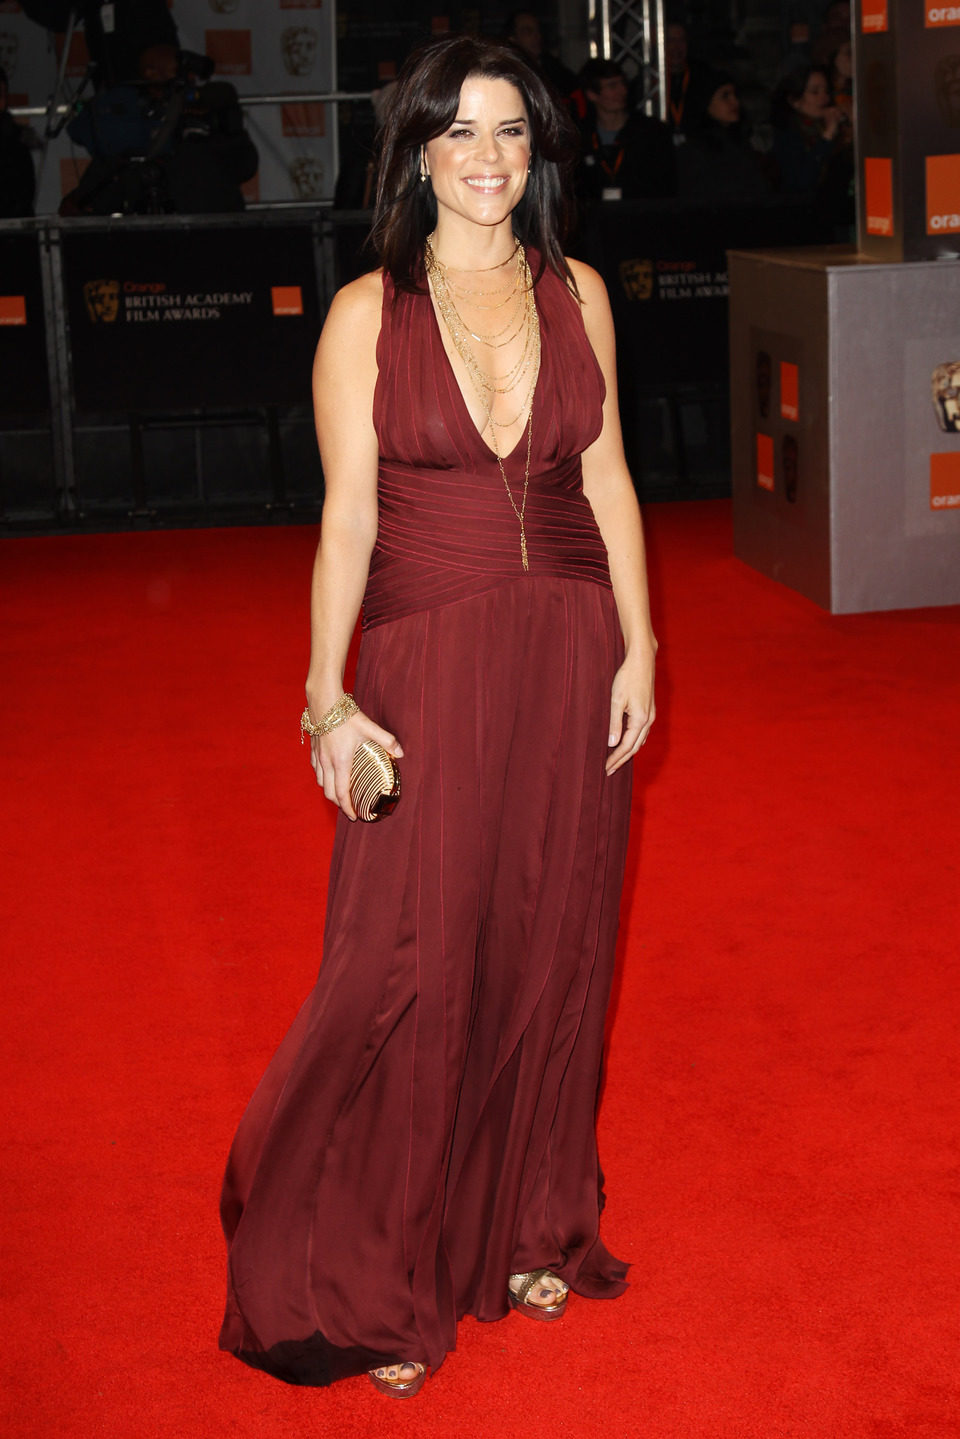 Neve Campbell de 'Scream' en los BAFTA 2011